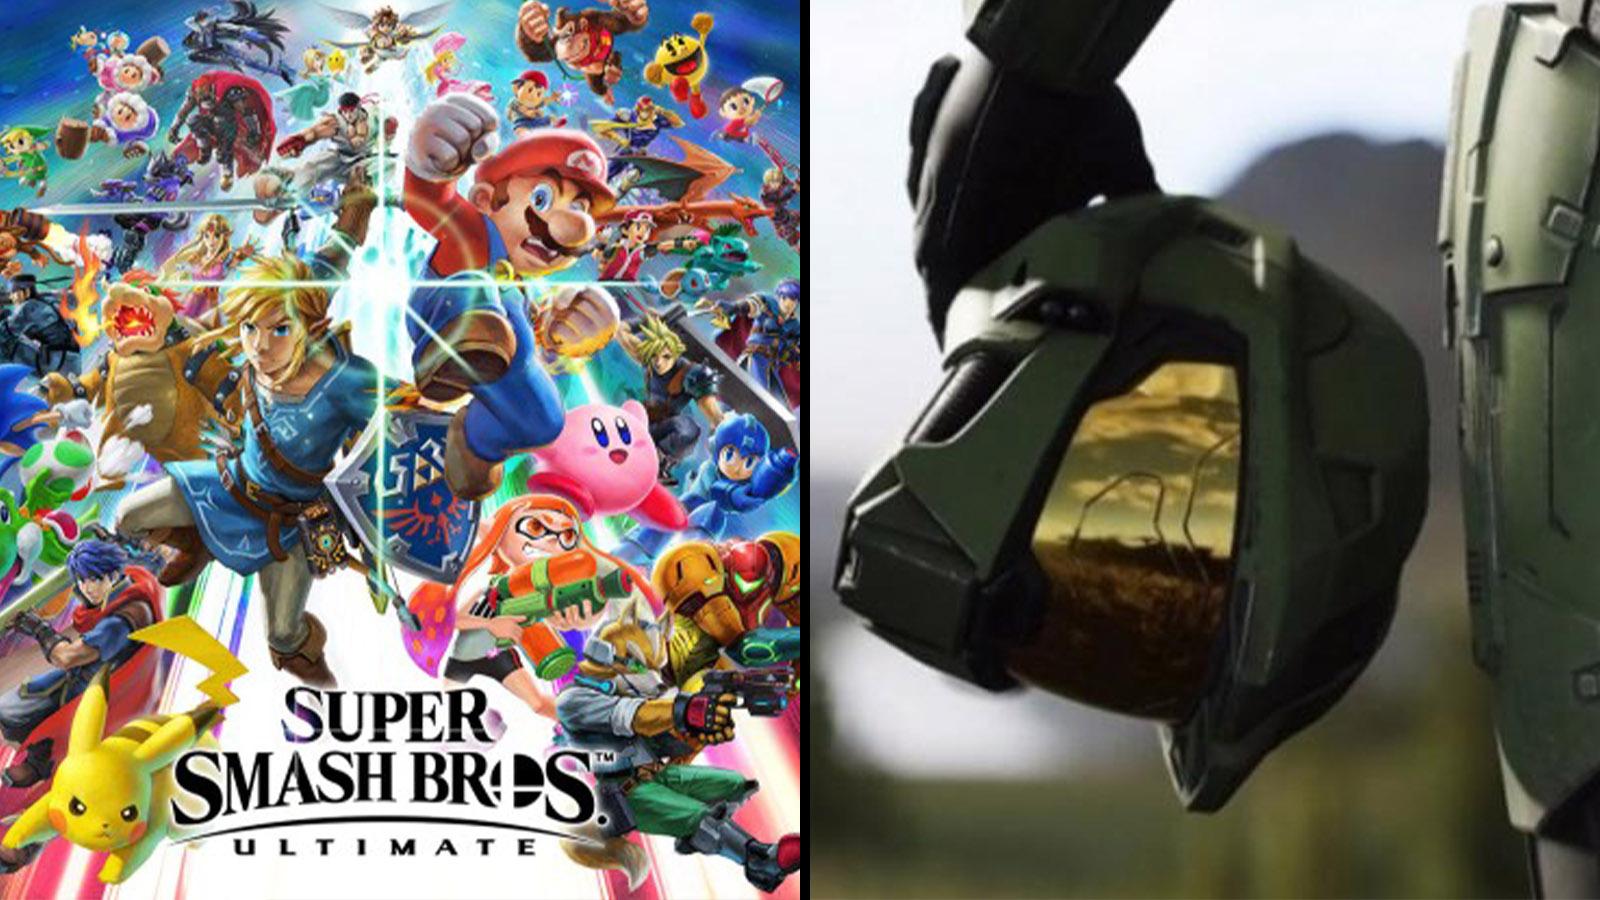 L: Nintendo R: Microsoft